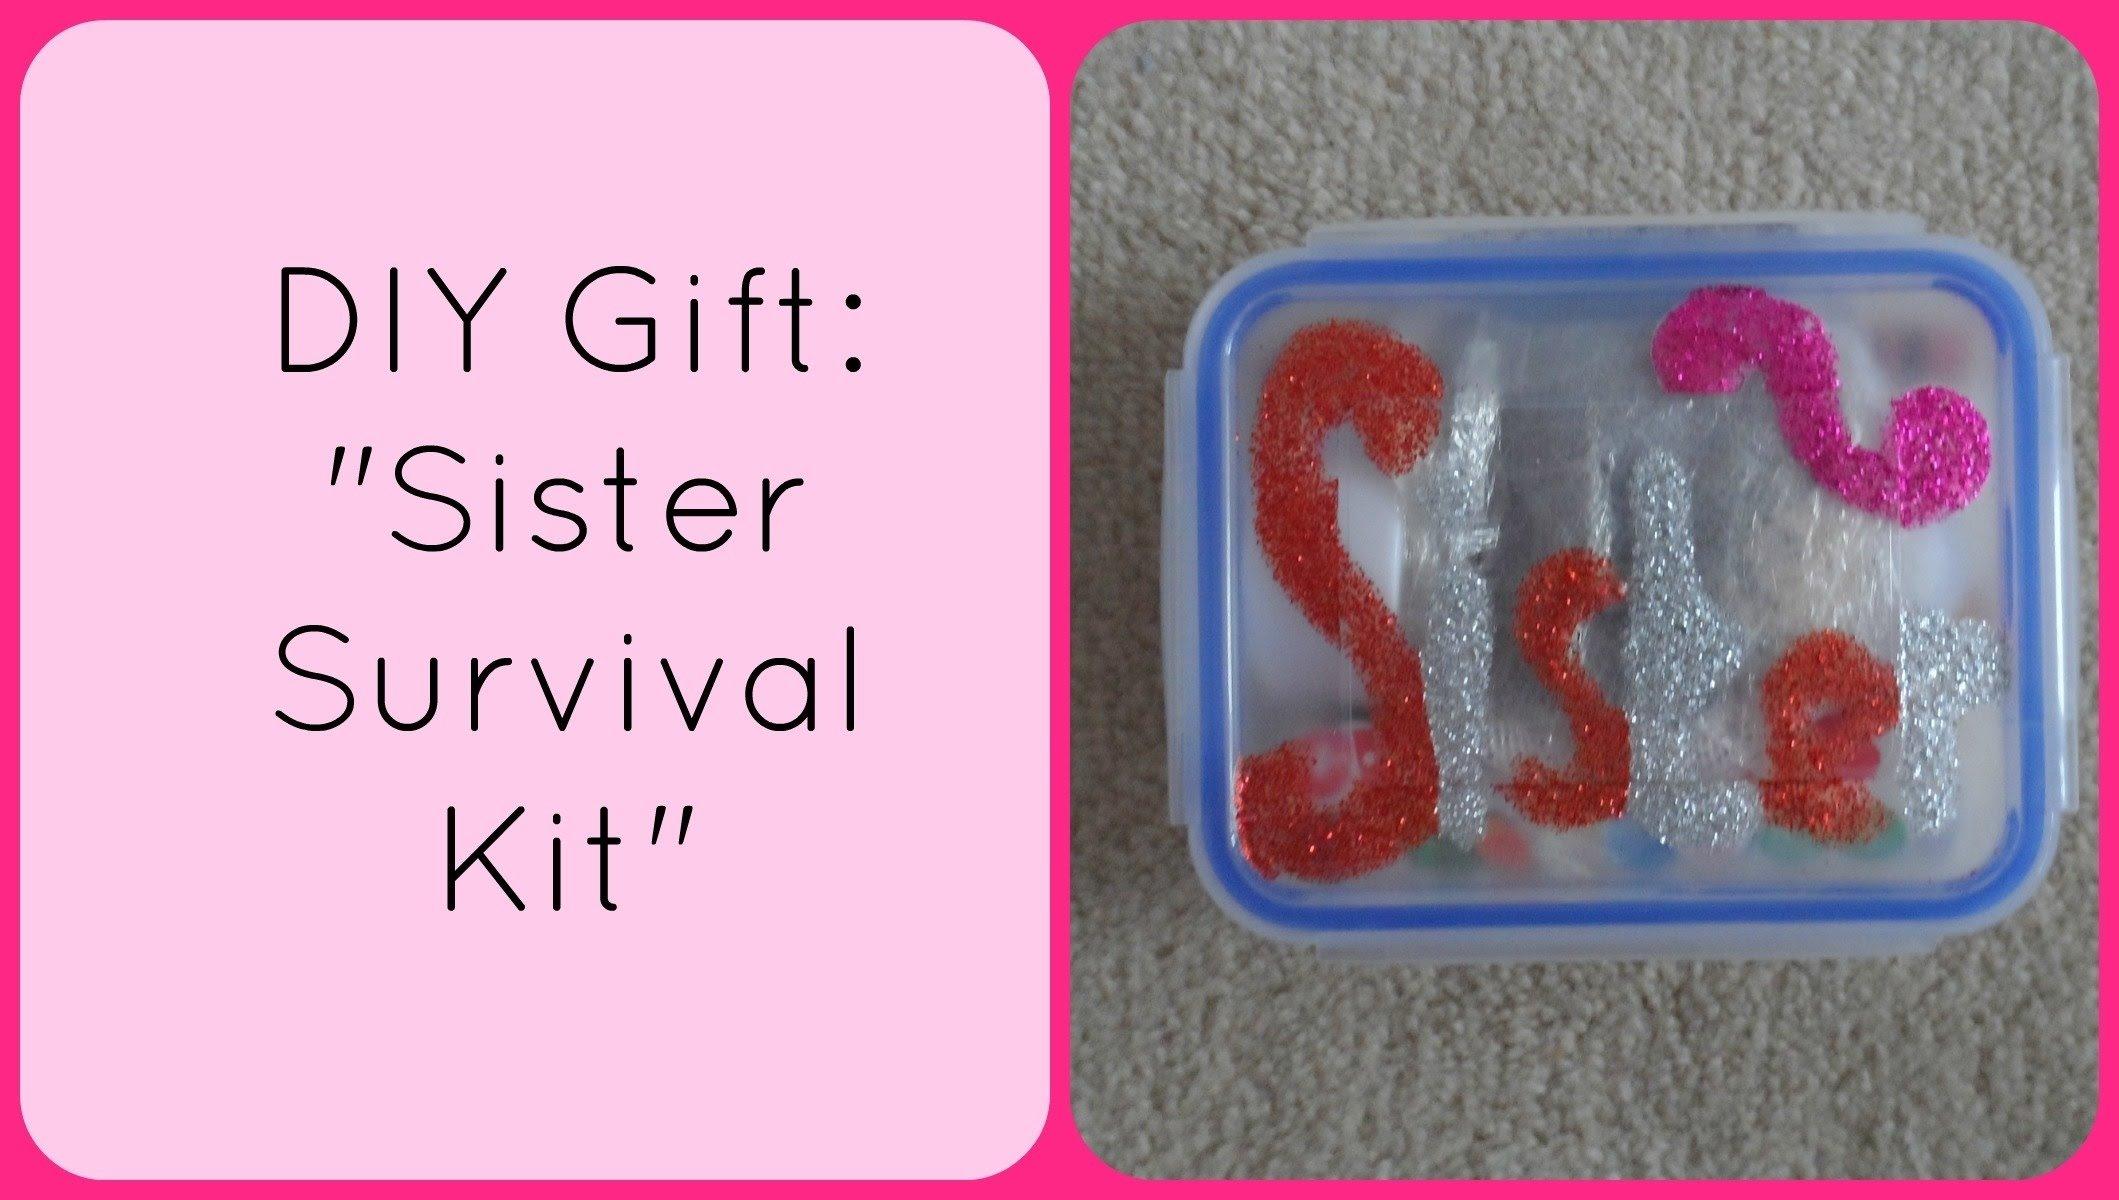 10 Lovable Christmas Present Ideas For Sister diy christmas gift sister survival kit accentgirl100 youtube 3 2020